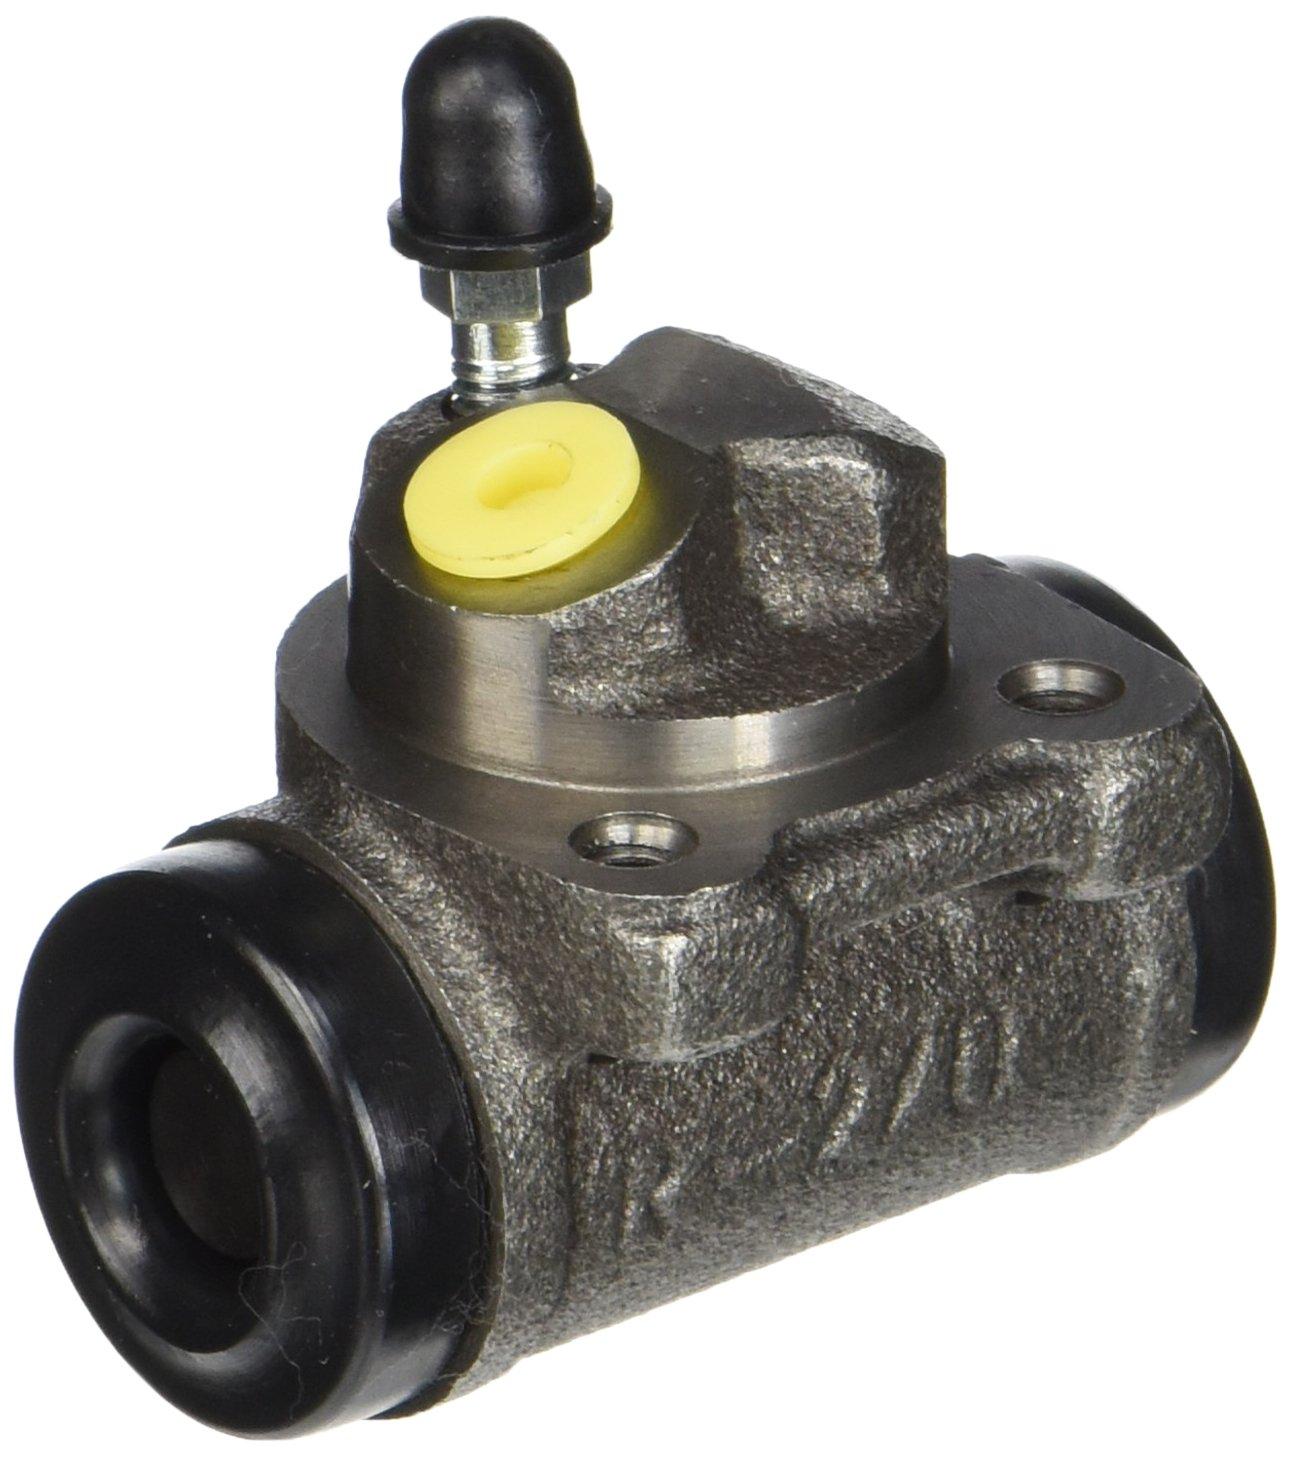 Ips Parts J ICR-4M03 Cilindretto Freno